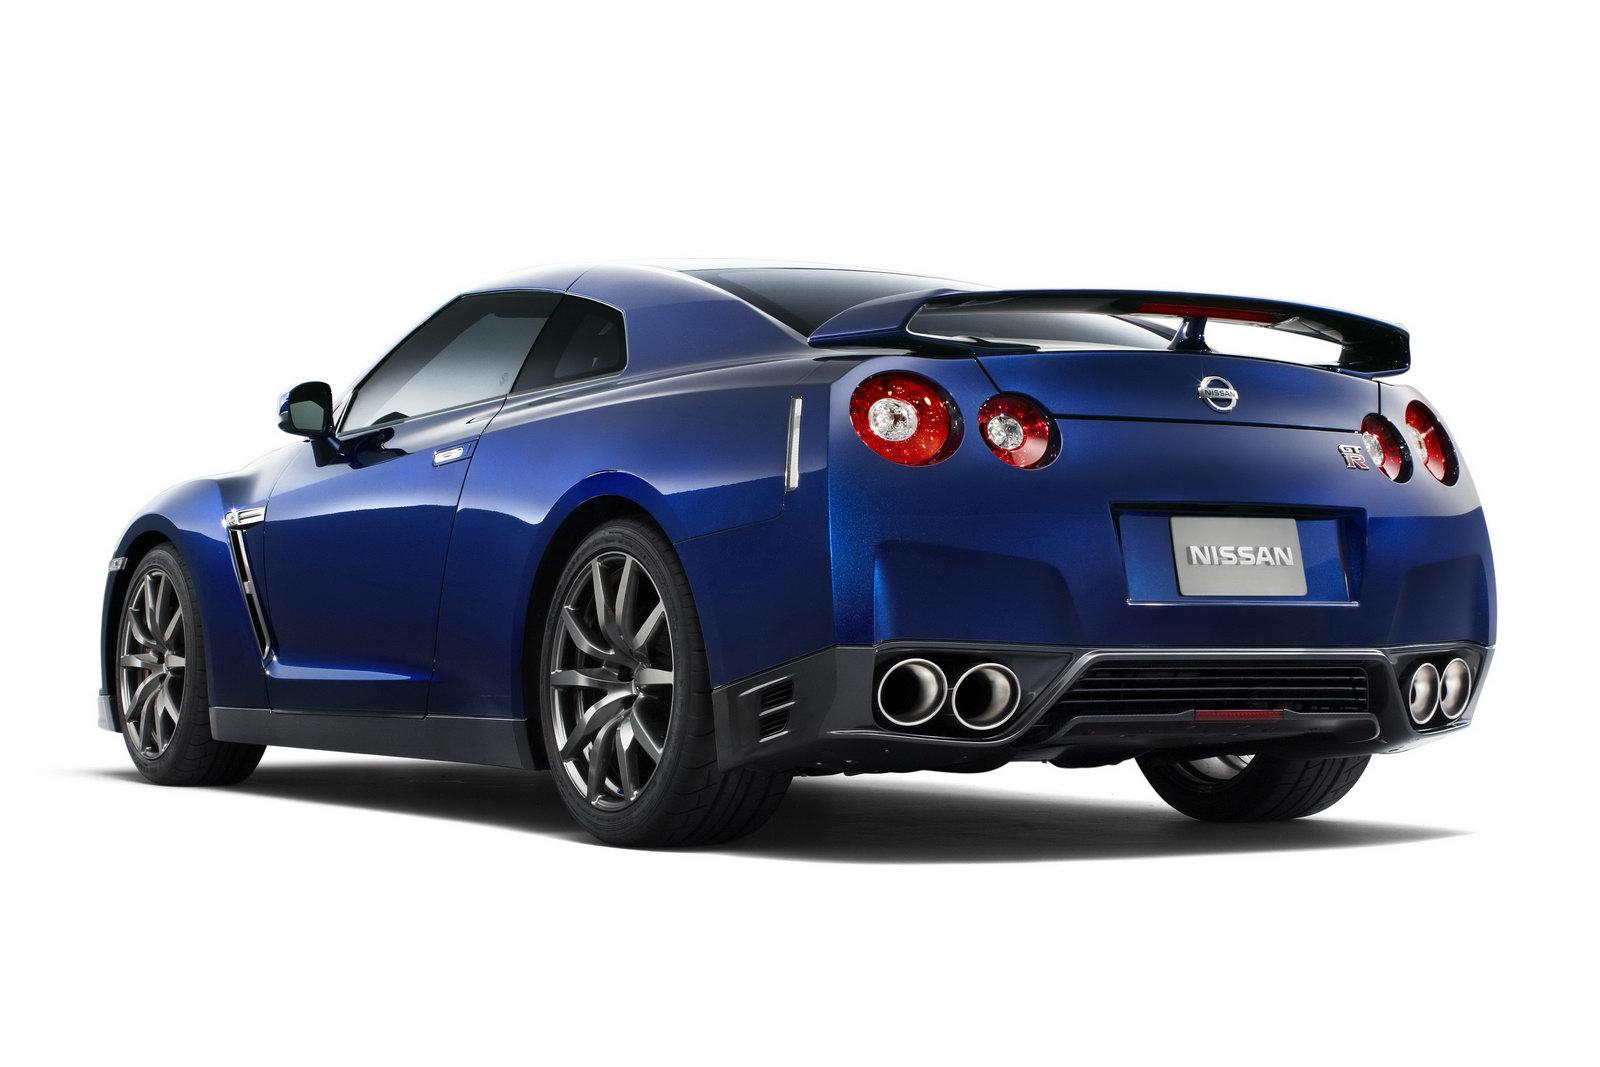 Wallpaper Download 2012 Nissan GT-R